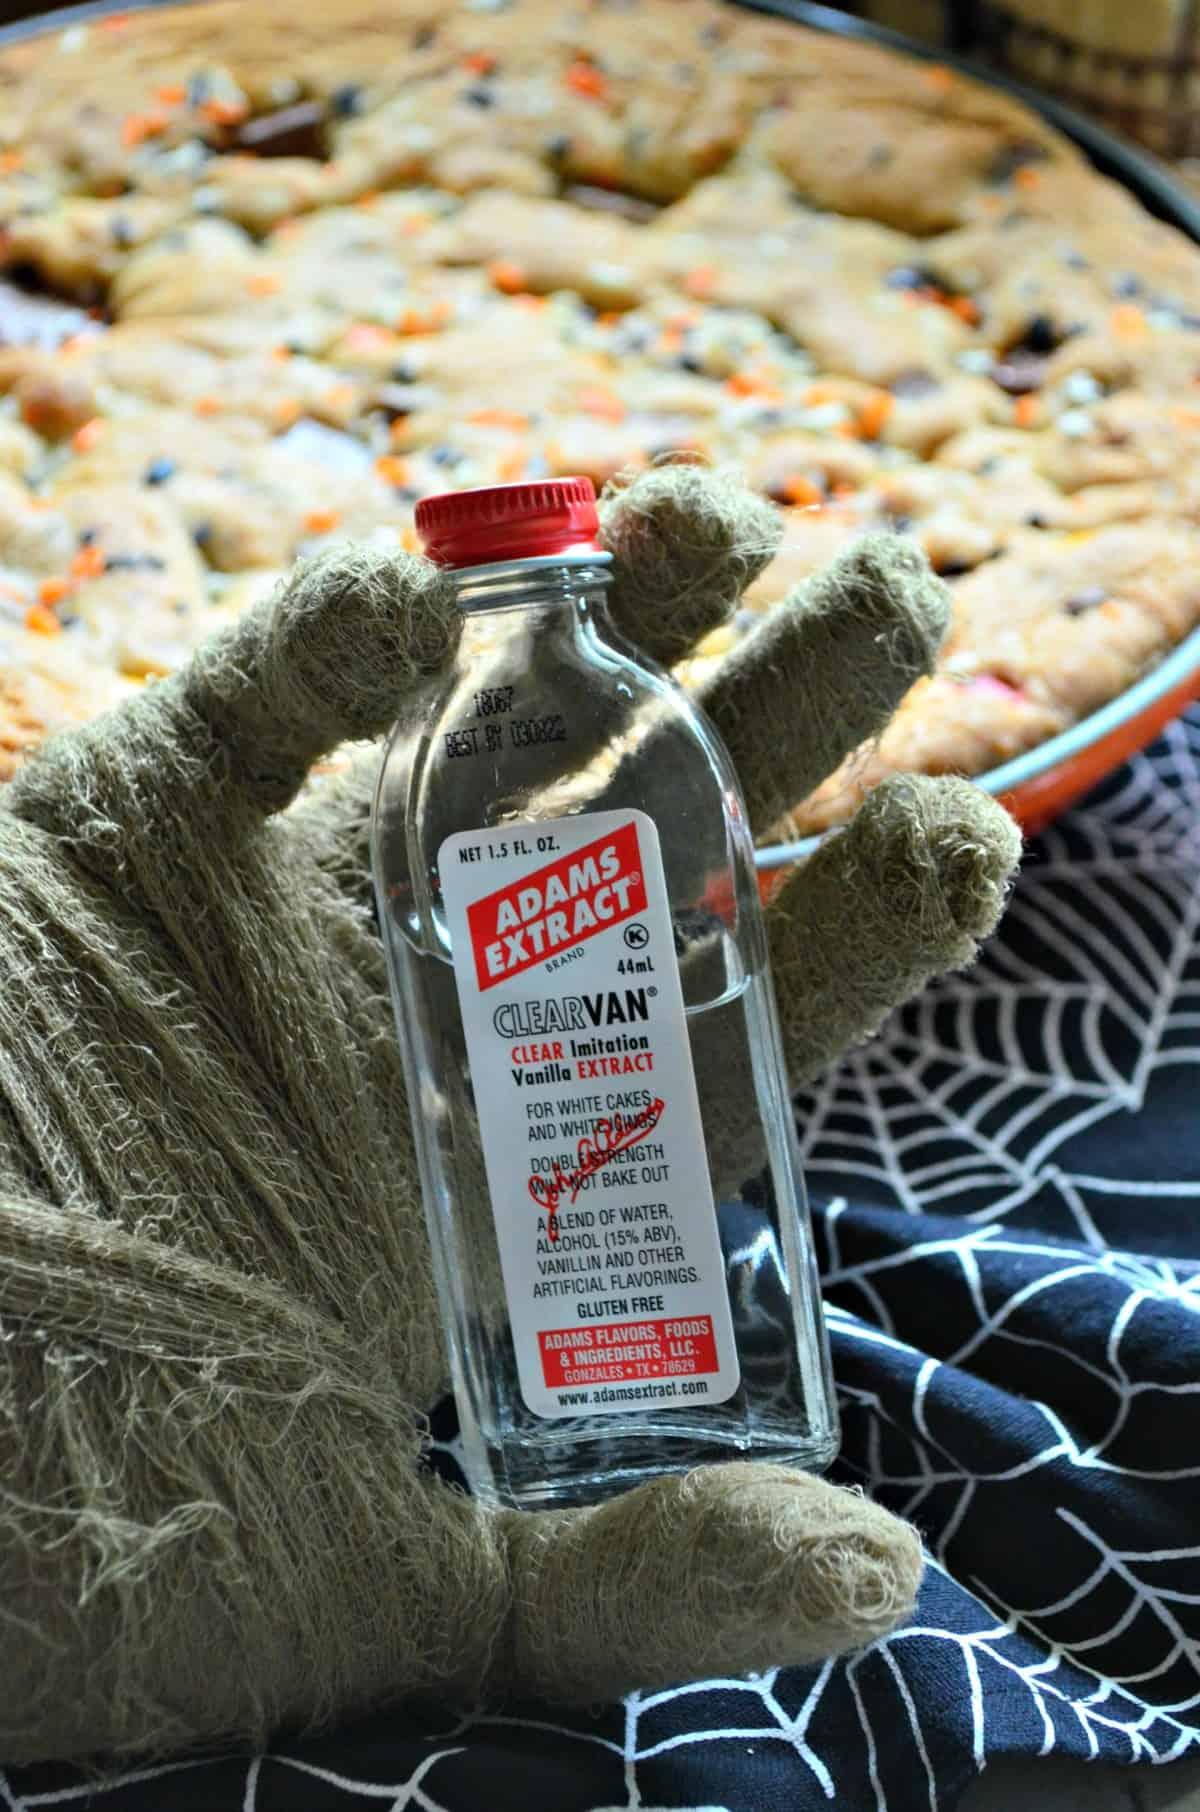 mummy hand holding up Adams Extract ClearVan imitation vanilla extract.